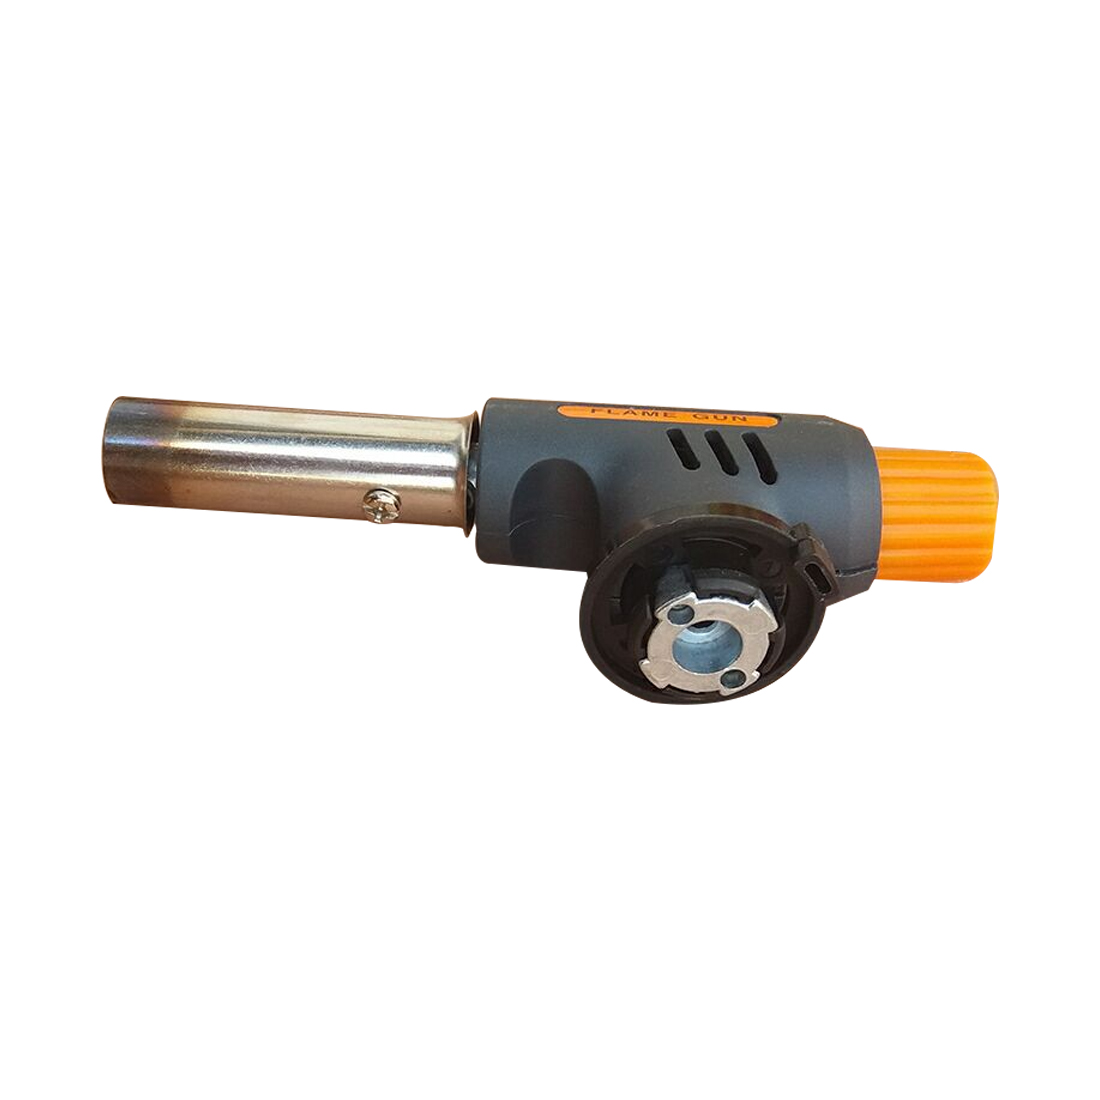 Gas Torch Flamethrower Butane Burner Automatic Ignition Baking Welding BBQ Camping Outdoor Hiking Fire Flame Gun